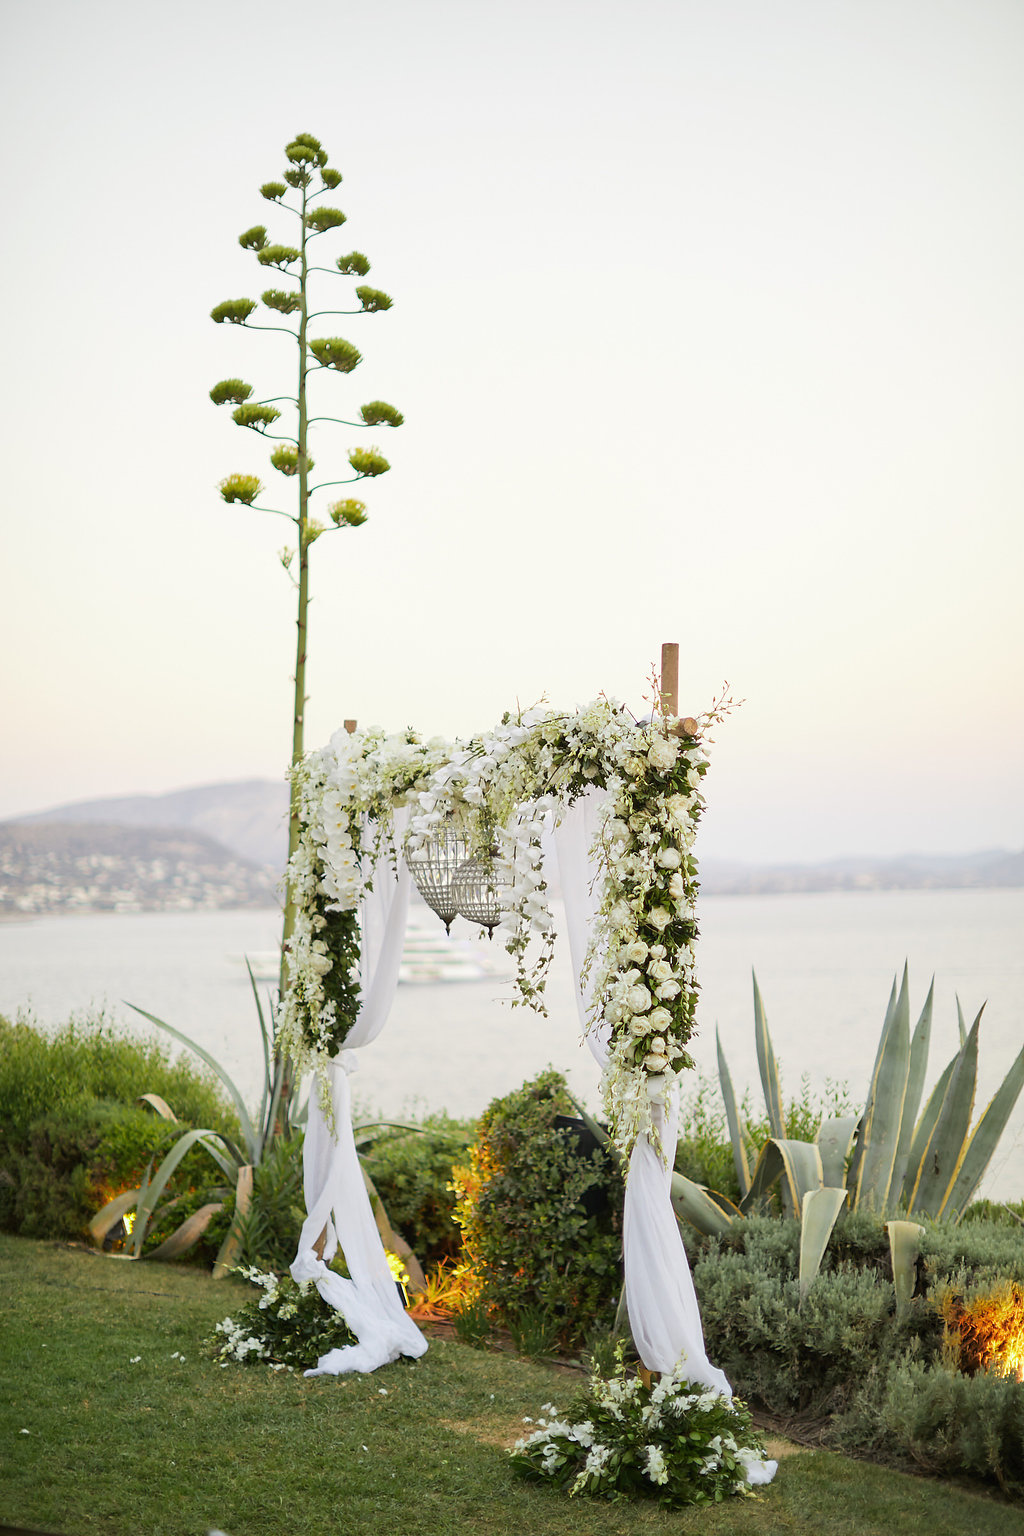 Chic Sunset Wedding on the Athens Riviera - photo by Sotiris Tsakanikas http://ruffledblog.com/chic-sunset-wedding-on-the-athens-riviera